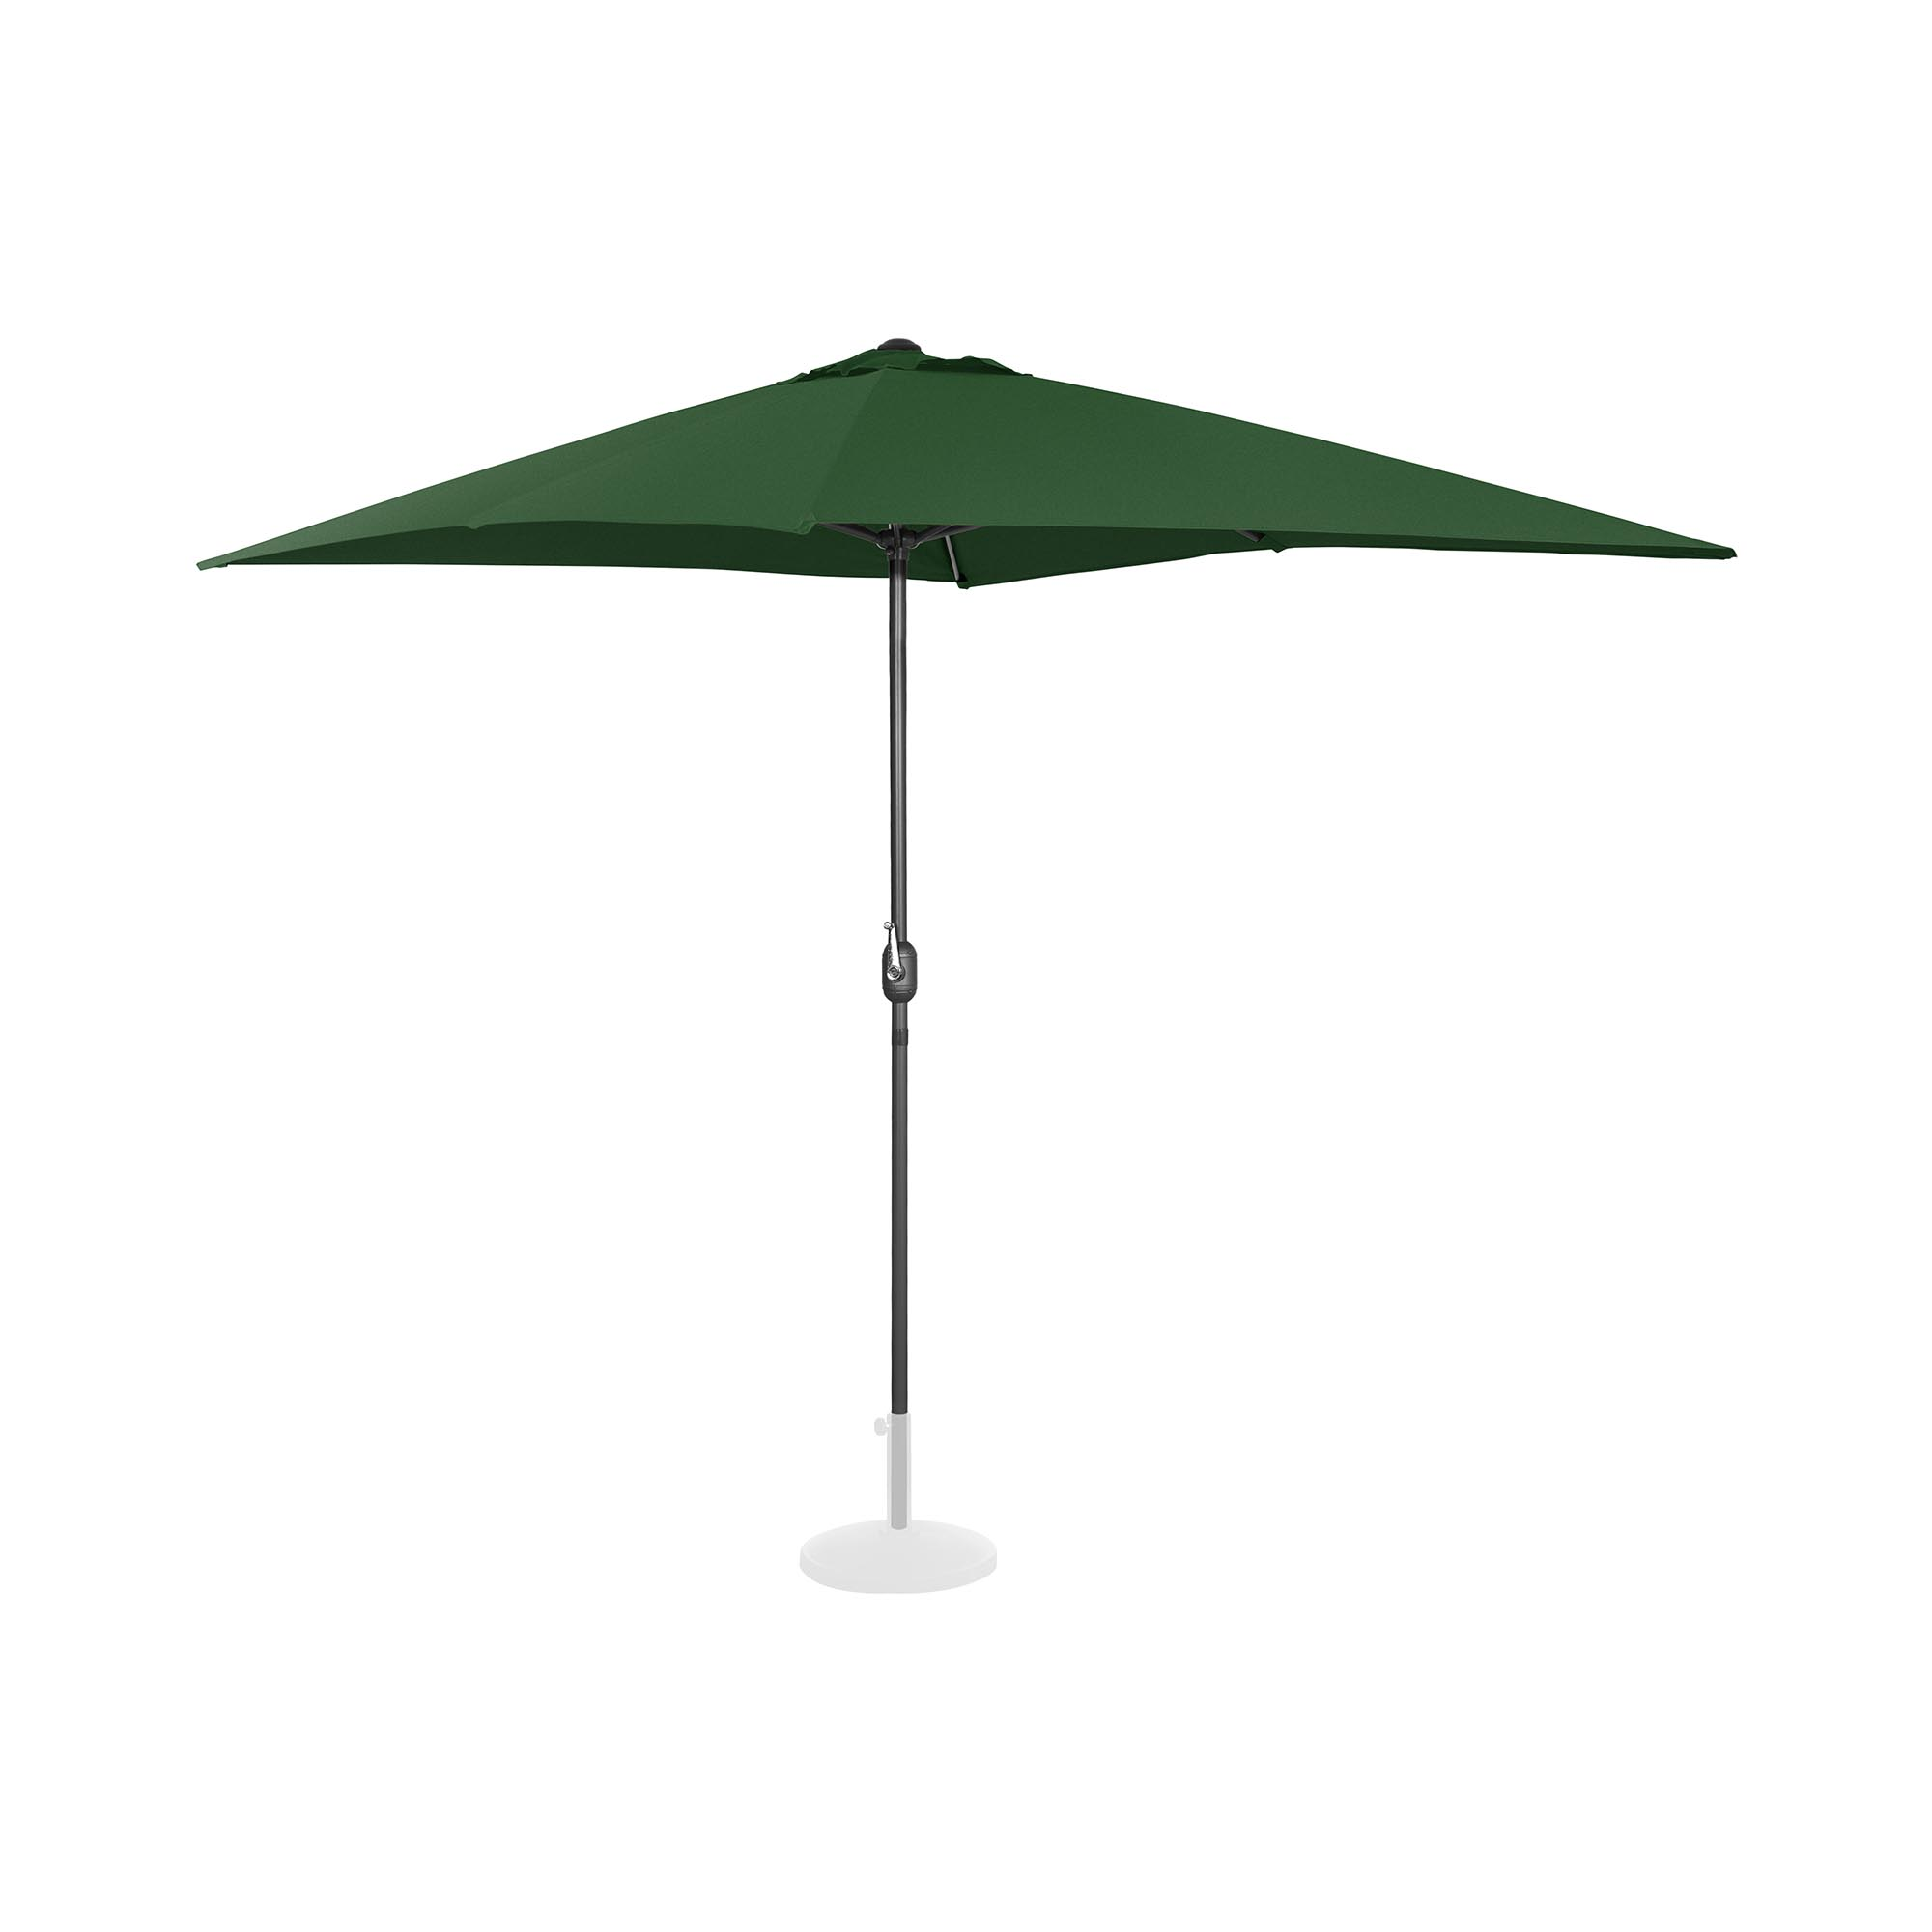 Uniprodo Sonnenschirm groß - grün - rechteckig - 200 x 300 cm 10250111